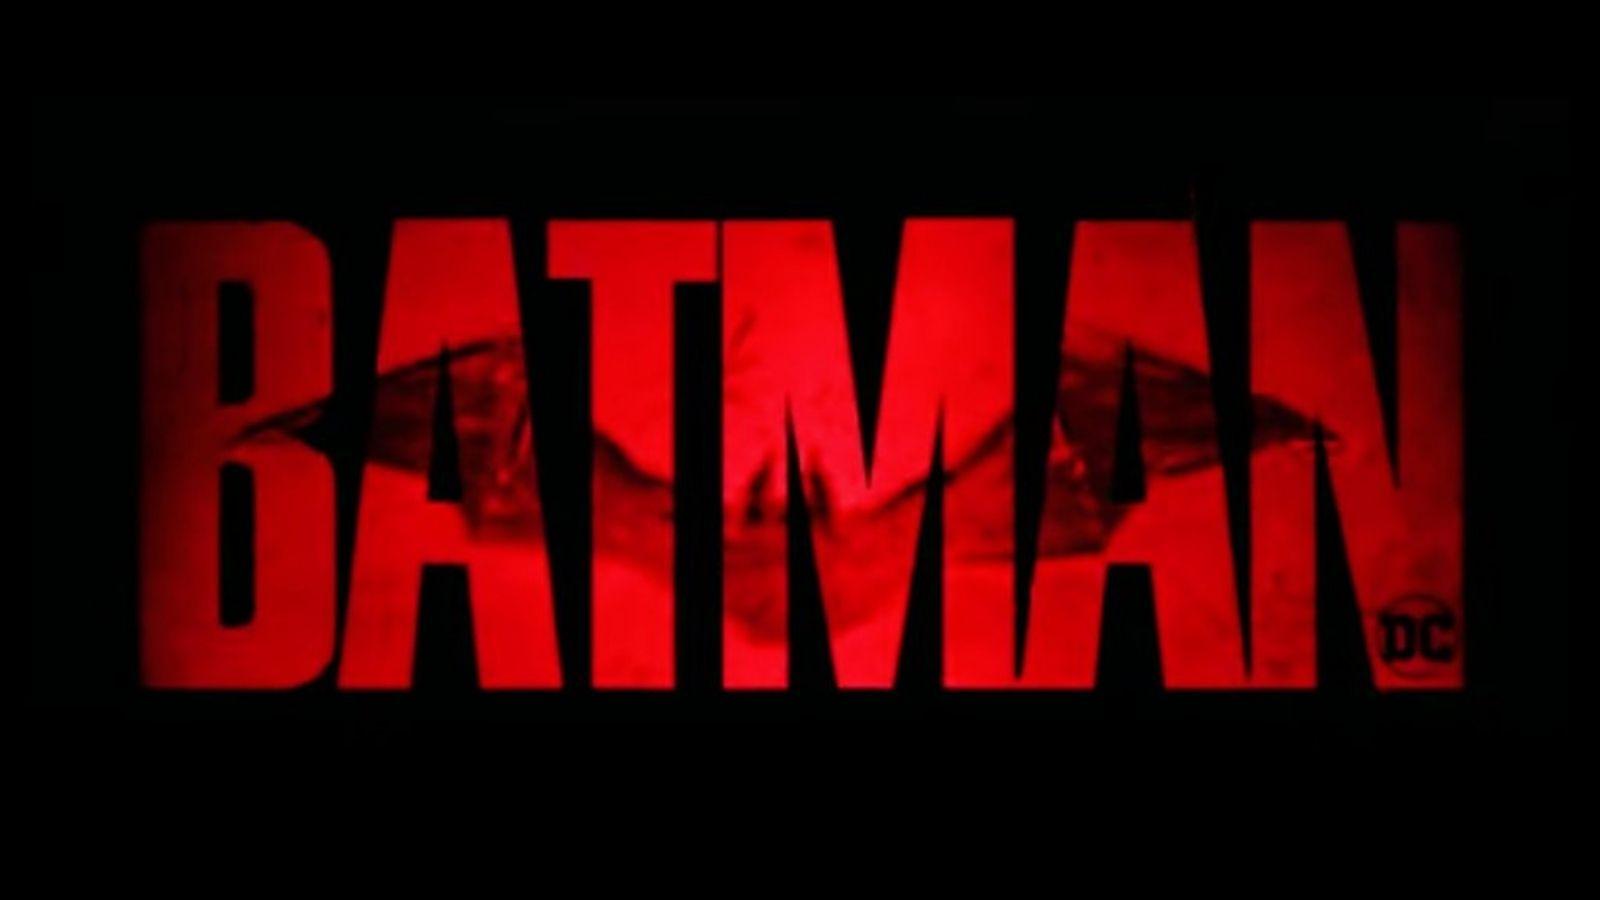 VIDEO: TRÁILER OFICIAL DE 'THE BATMAN' MUESTRA OTRA FACETA DE PATTINSON